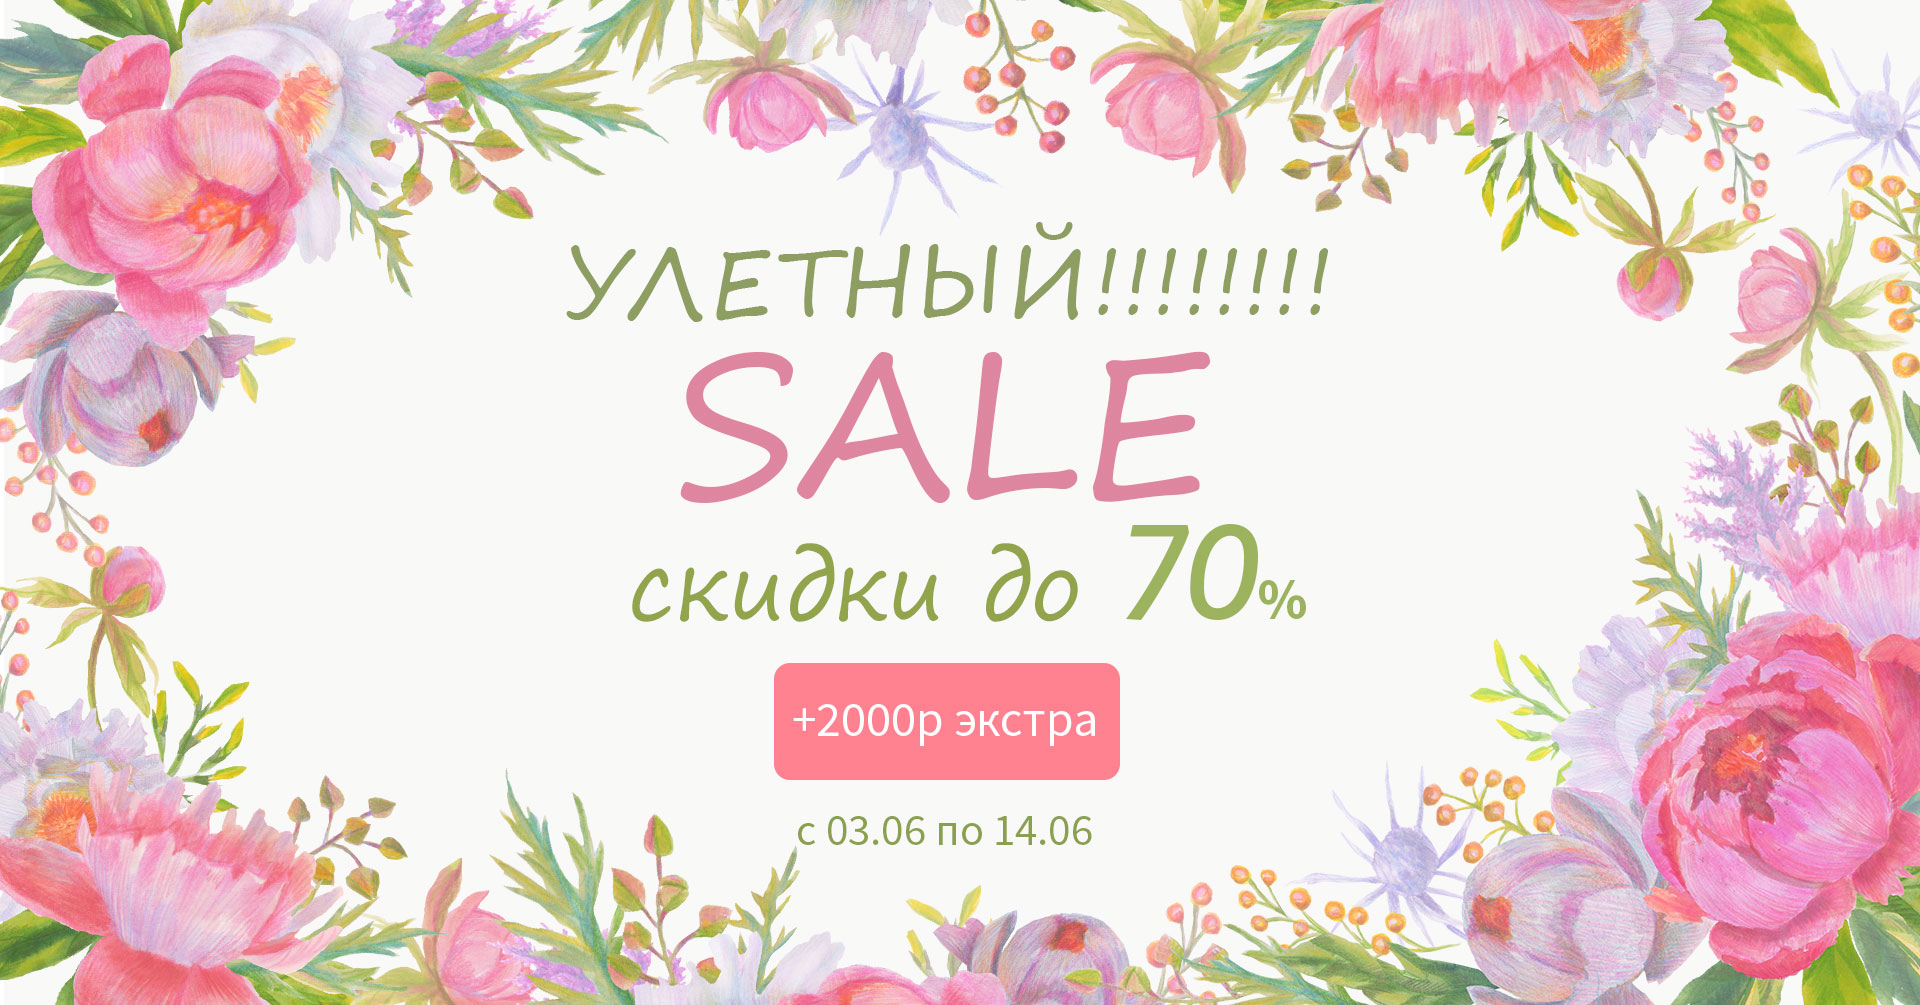 улетный-sale